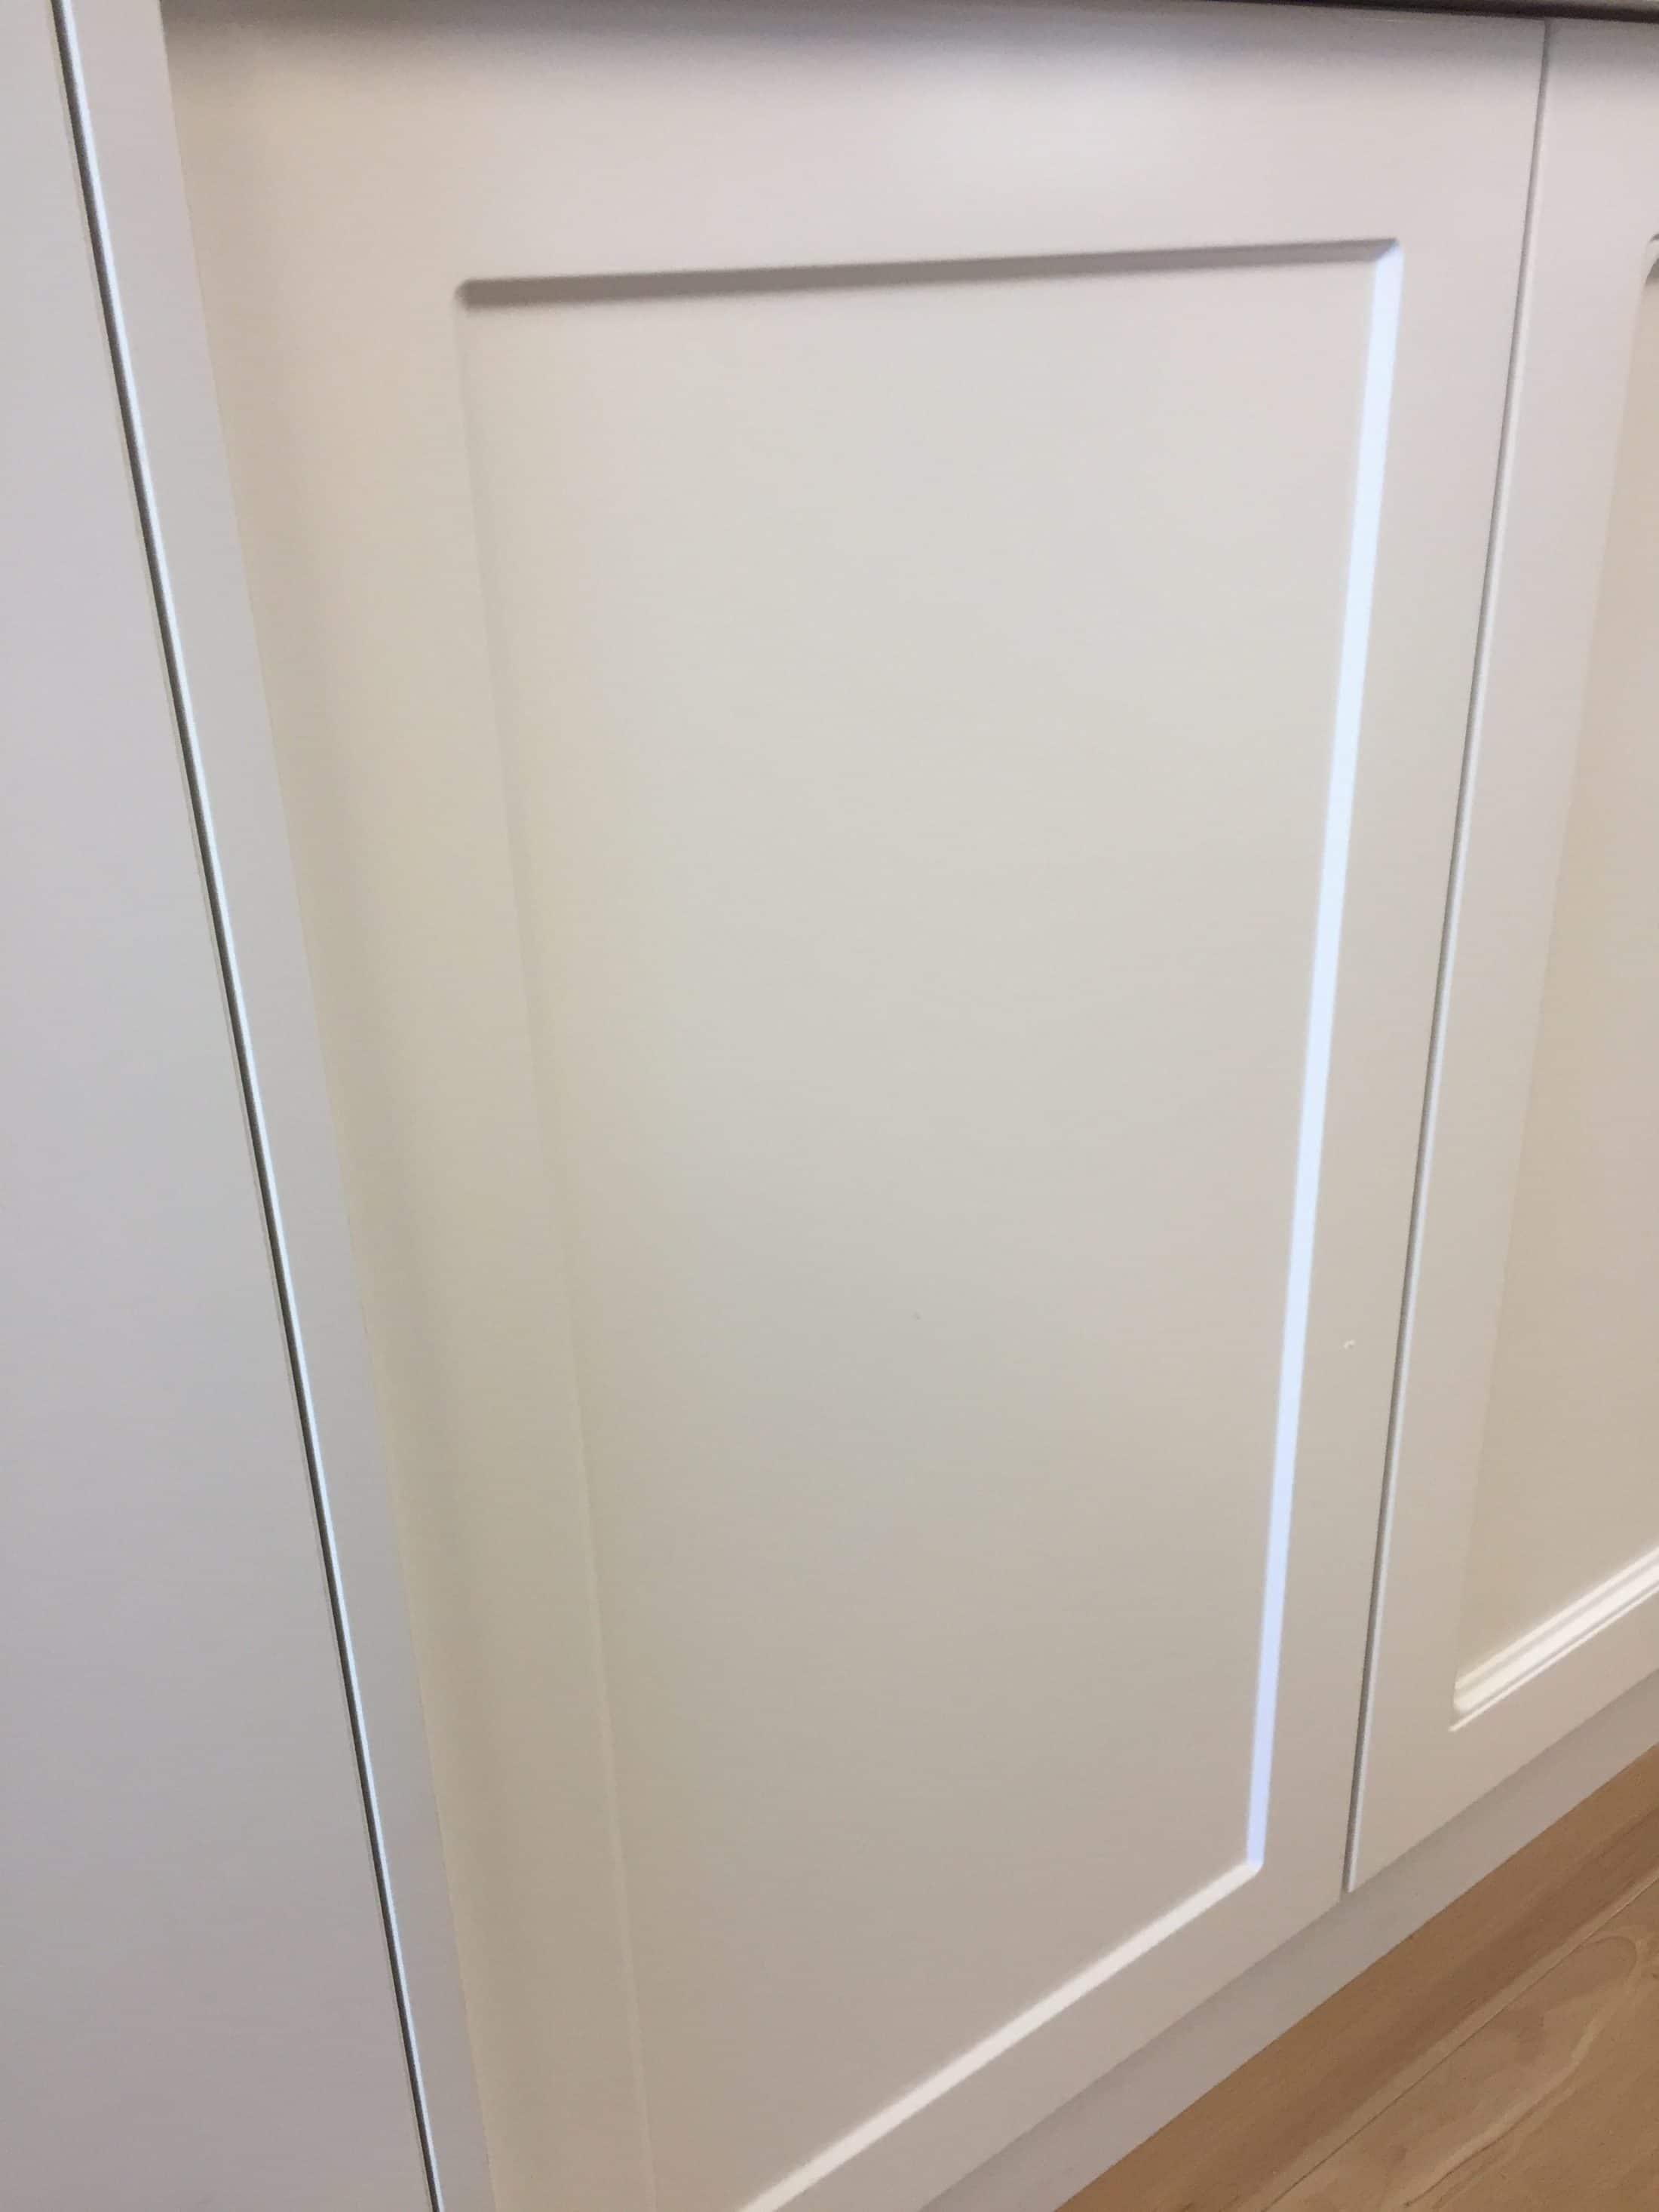 2 Pack Profile Door Only Quick Kitchens